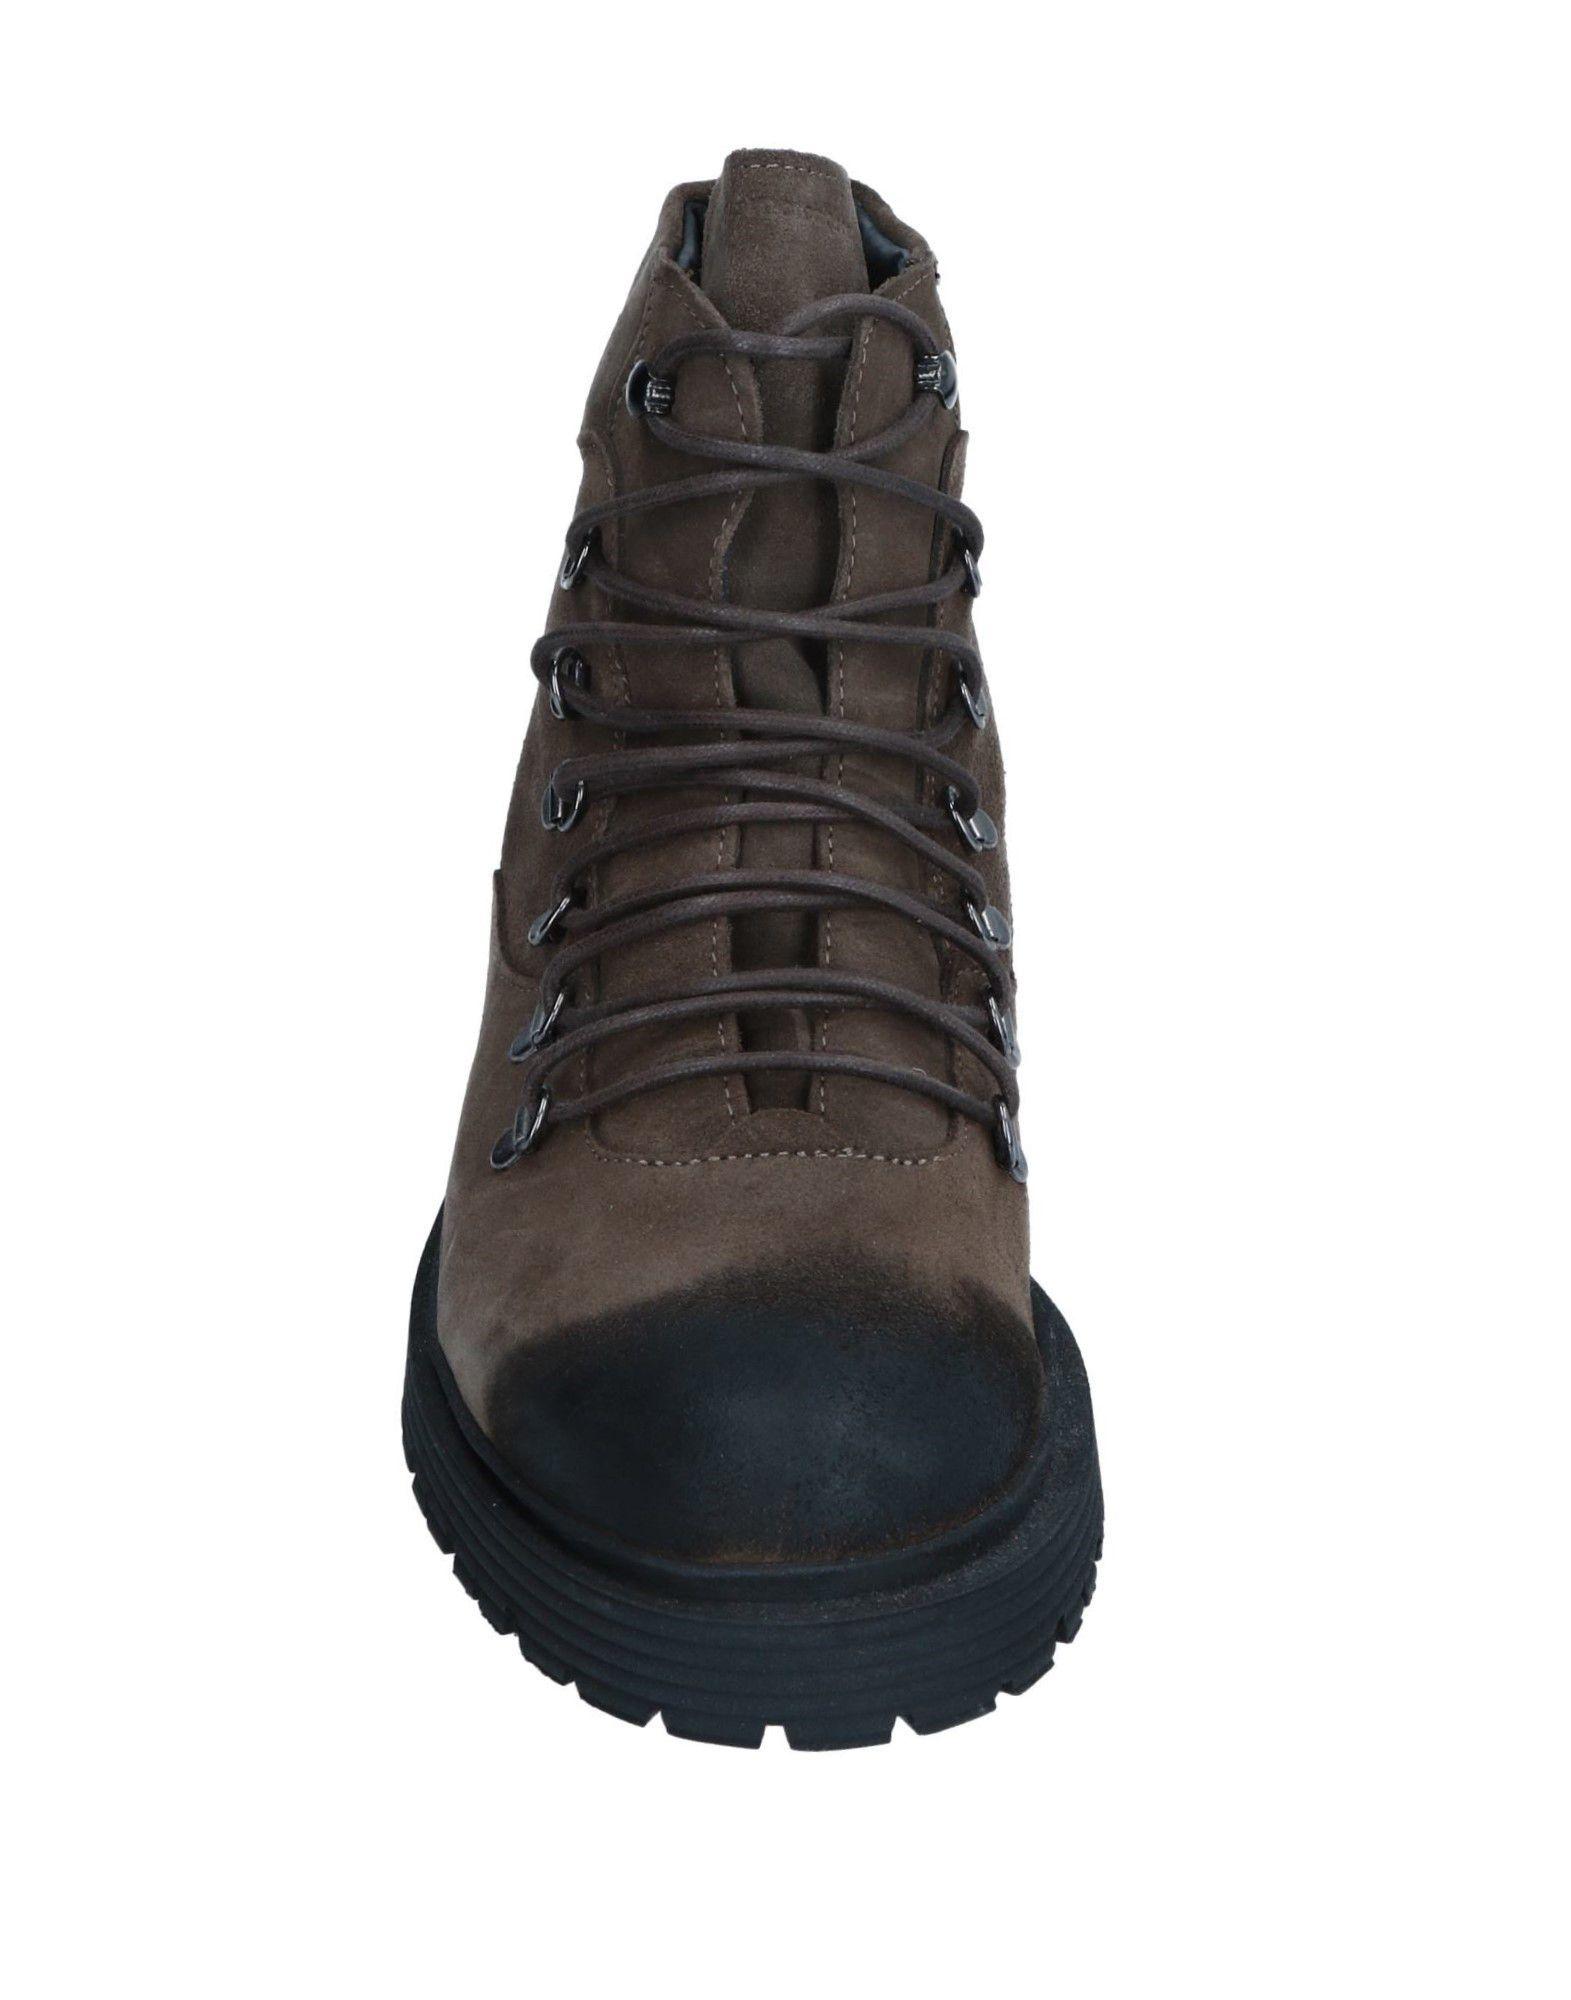 Bottega 11544040VE Marchigiana Stiefelette Herren  11544040VE Bottega Gute Qualität beliebte Schuhe f75ba0